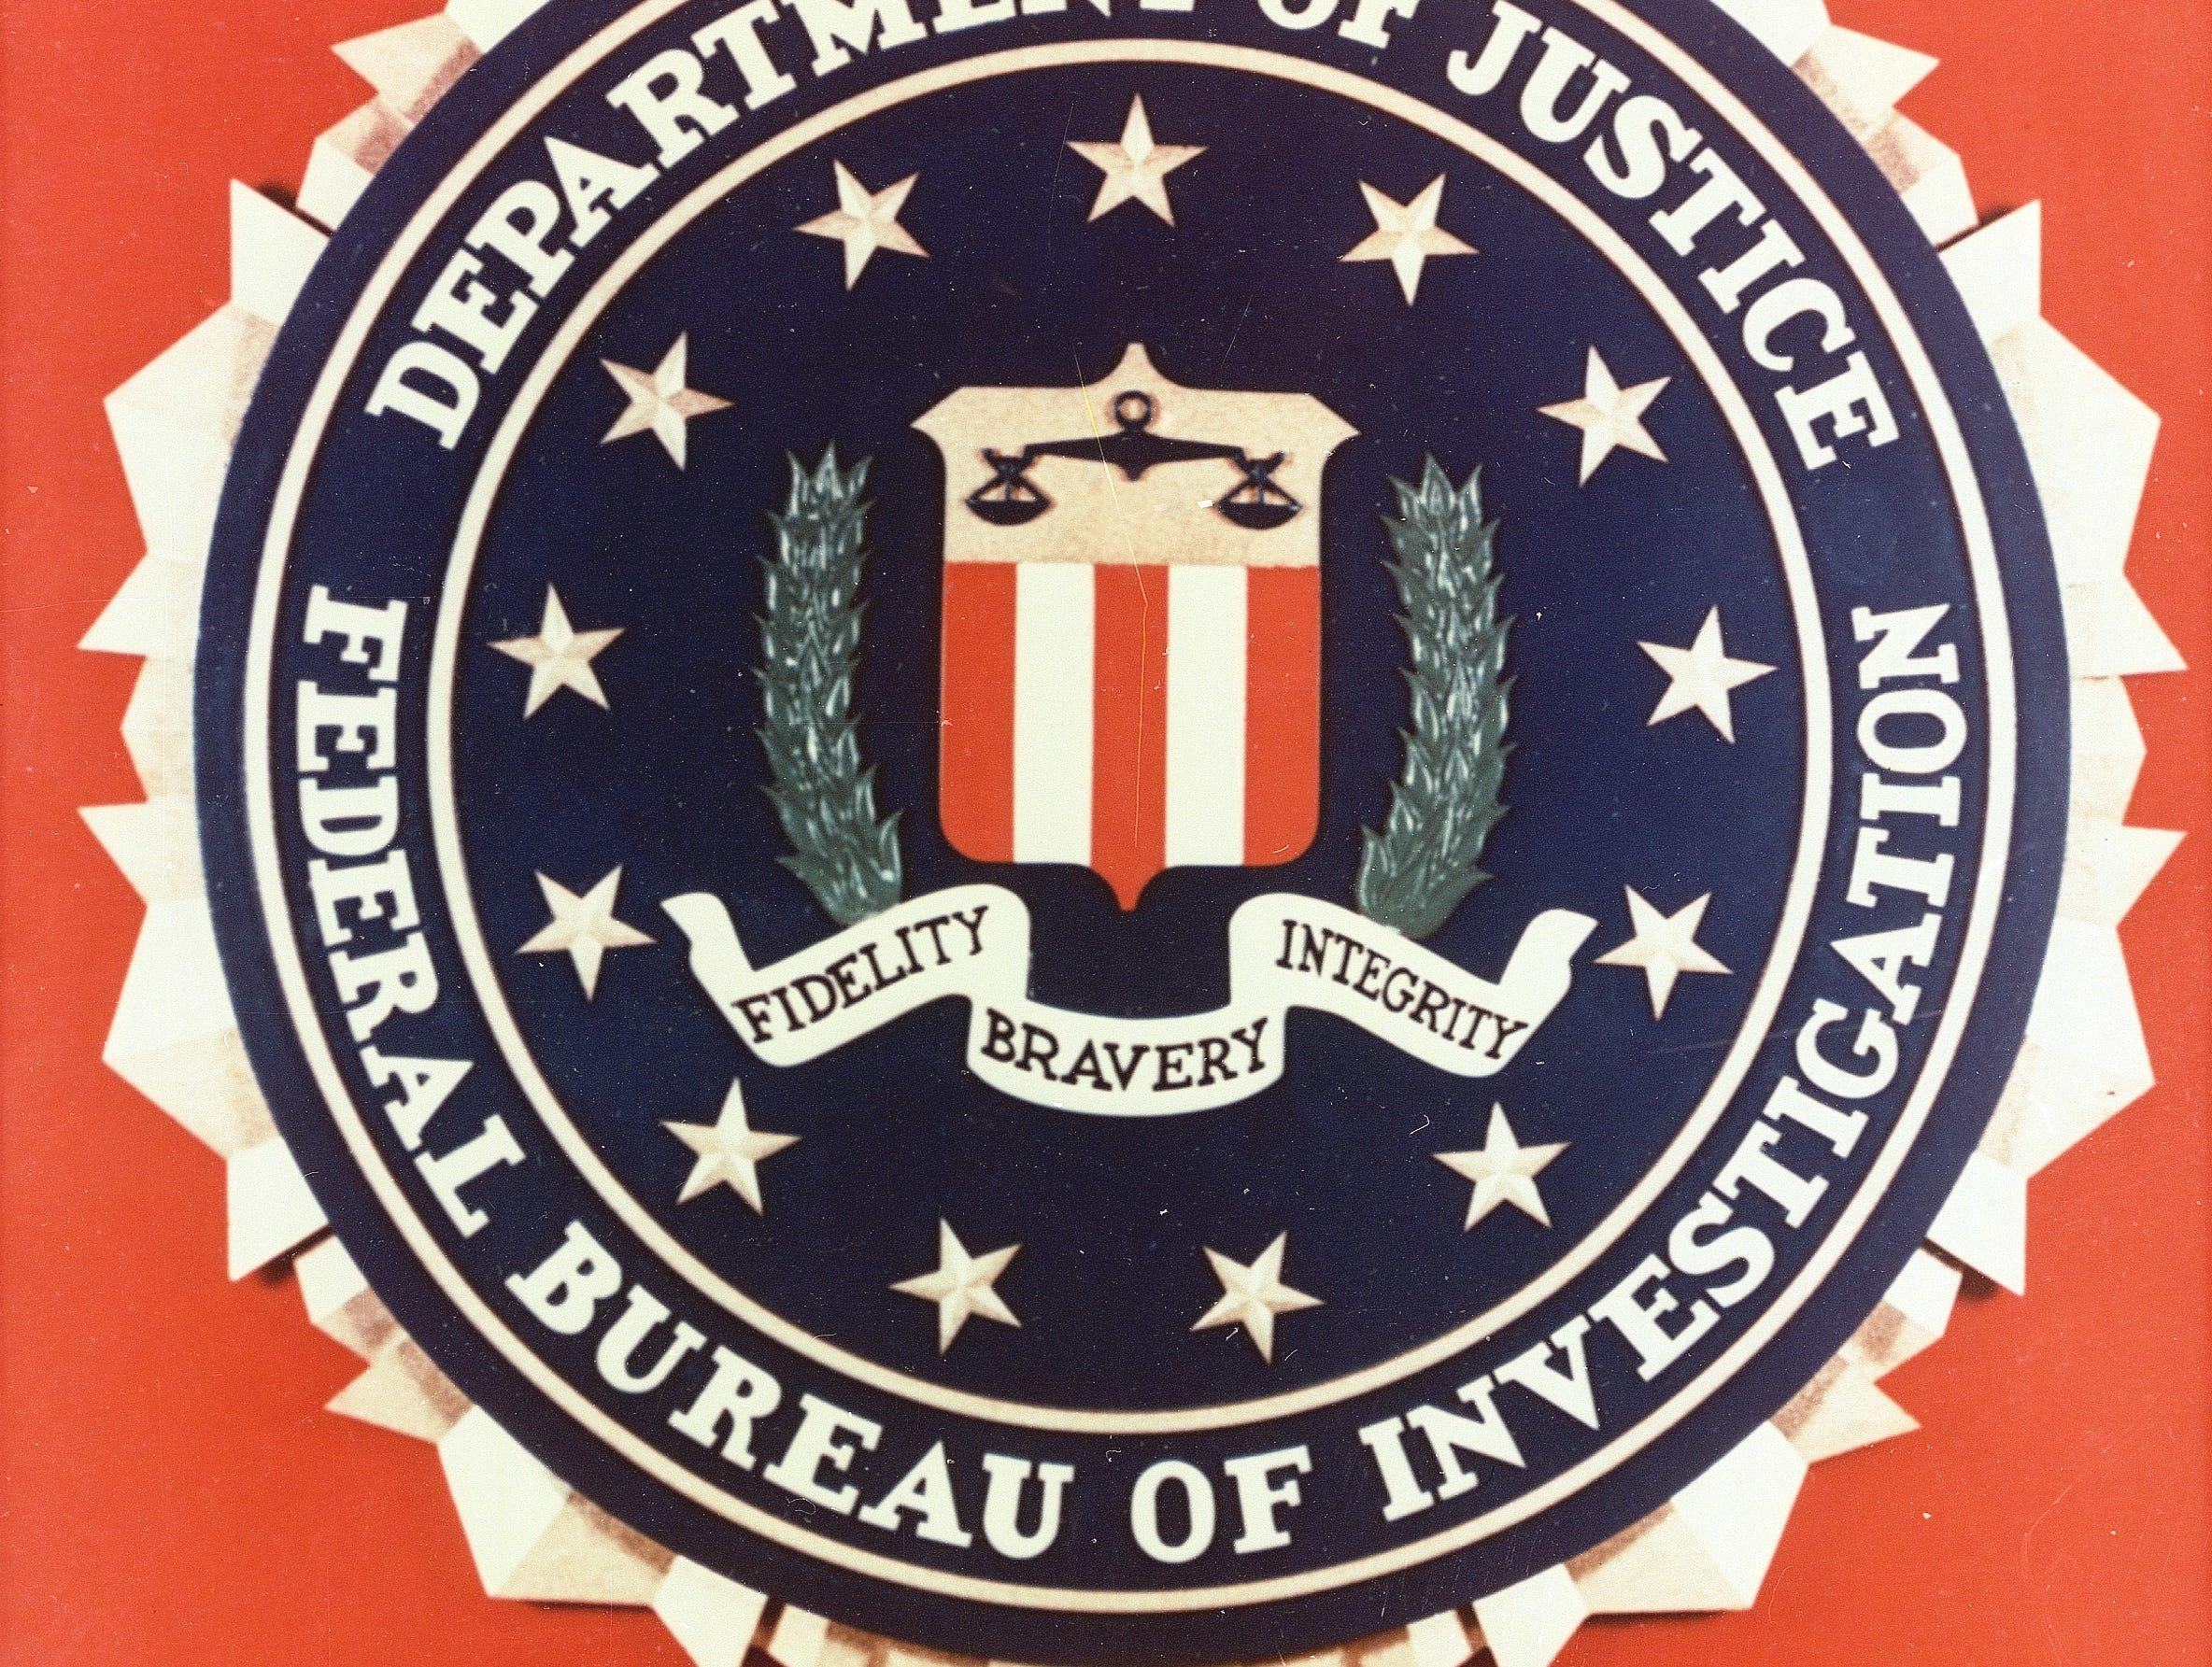 http://www.gannett-cdn.com/-mm-/194cc82590cd0f9626a8649ccfecfa44dc21adc7/c=0-660-2368-2445&r=2368x1785&r=x404&c=534x401/local/-/media/USATODAY/USATODAY/2013/08/07/1375921718000-AP-AXX-FBI-SEAL.jpg